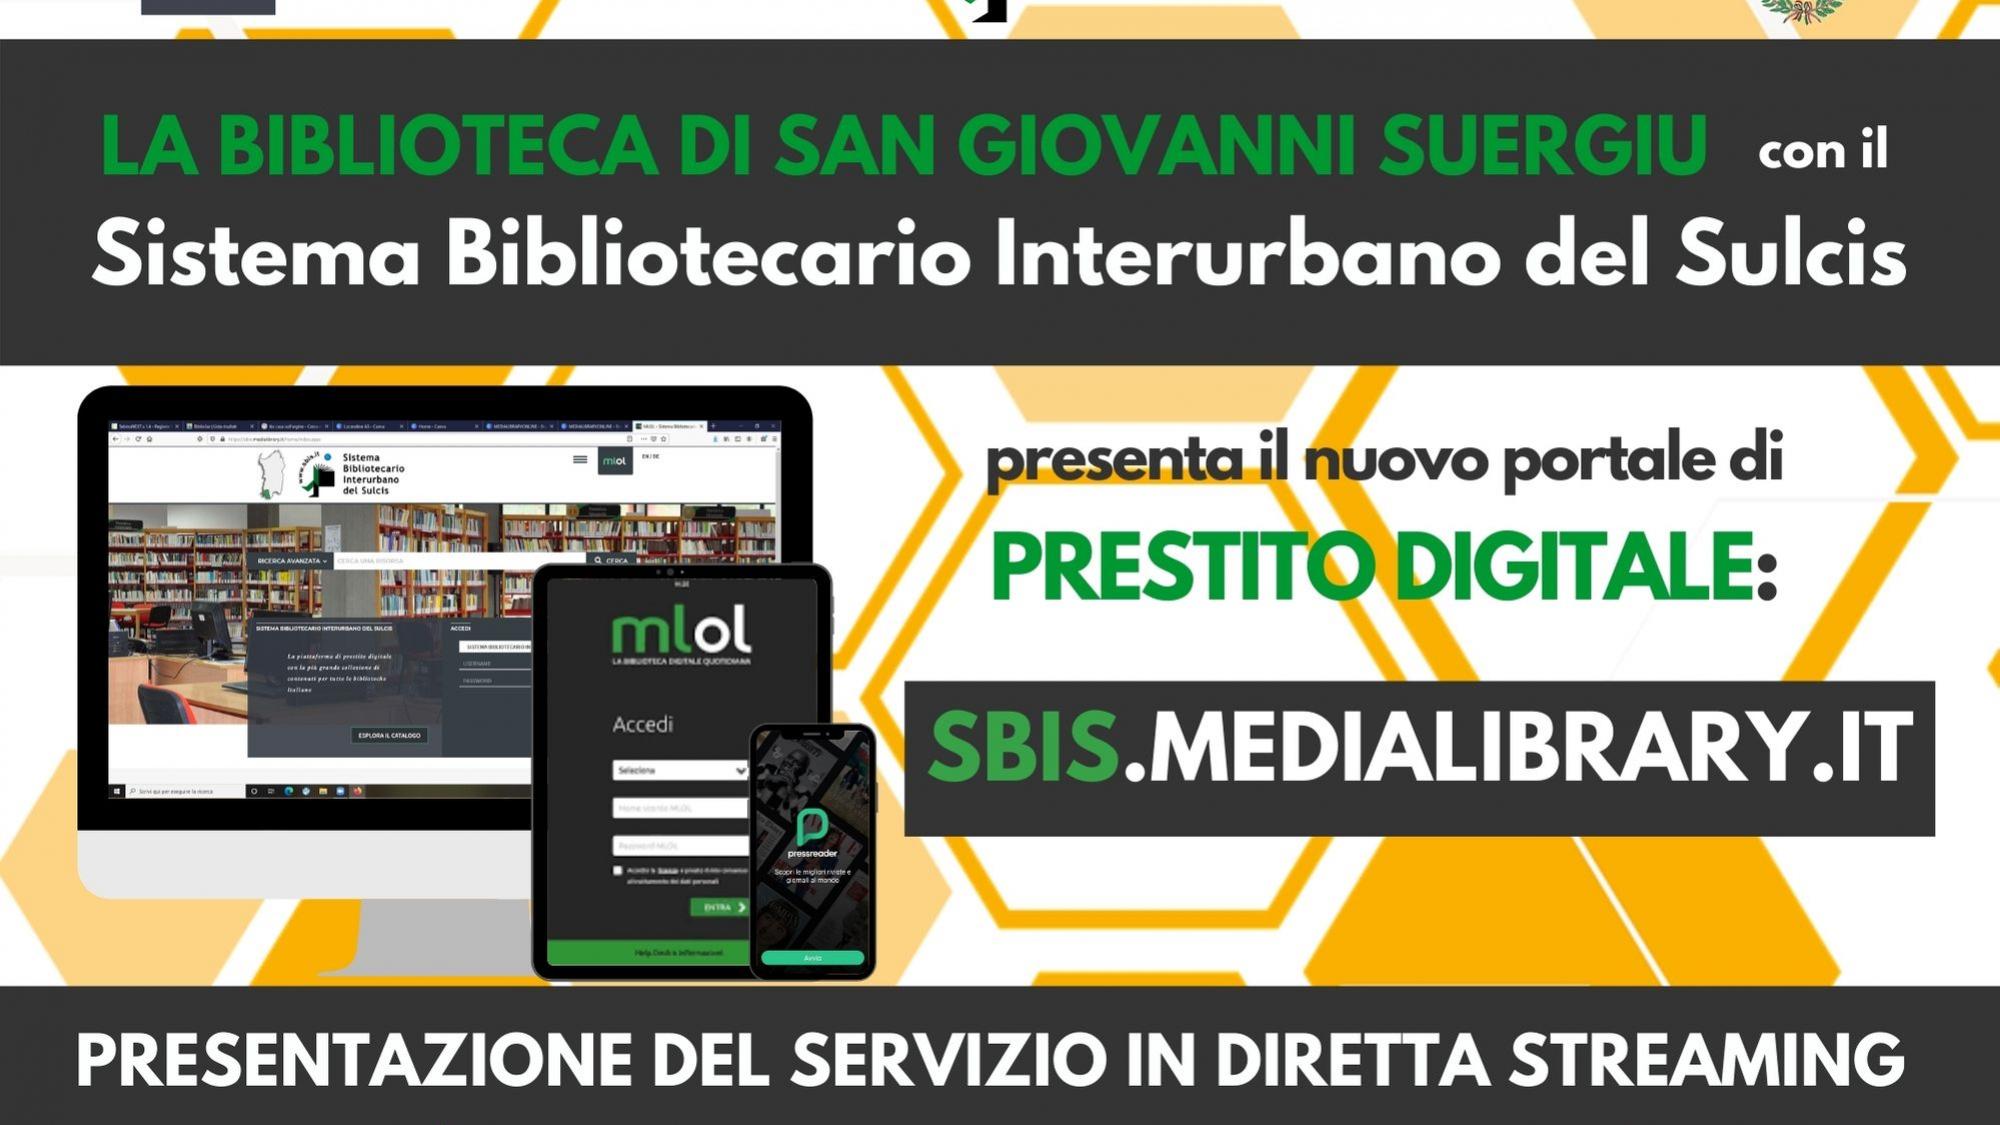 Locandina MLOL evento San Giovanni Suergiu